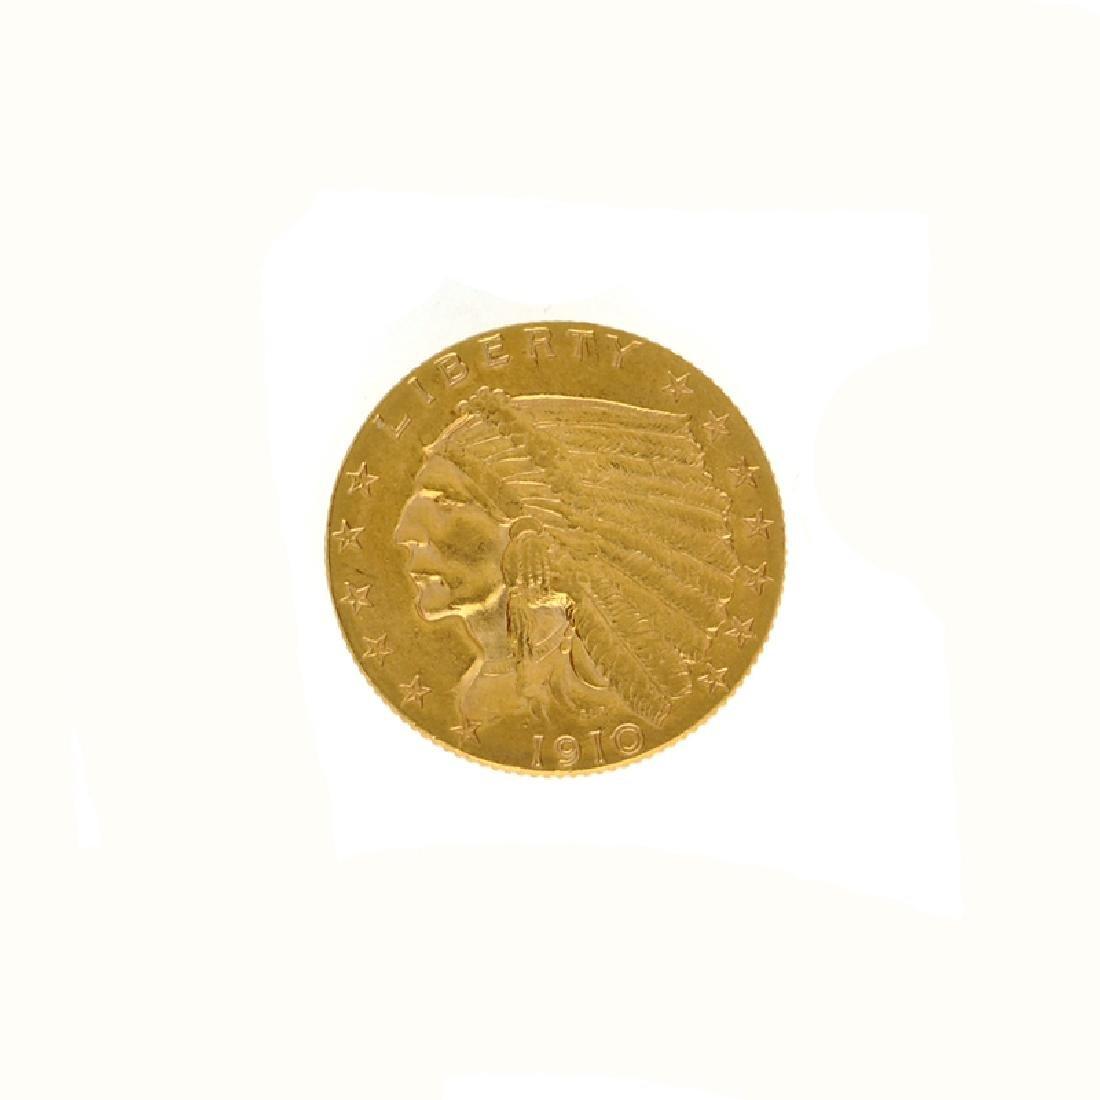 *1910 $2.50 U.S. Indian Head Gold Coin (DF)